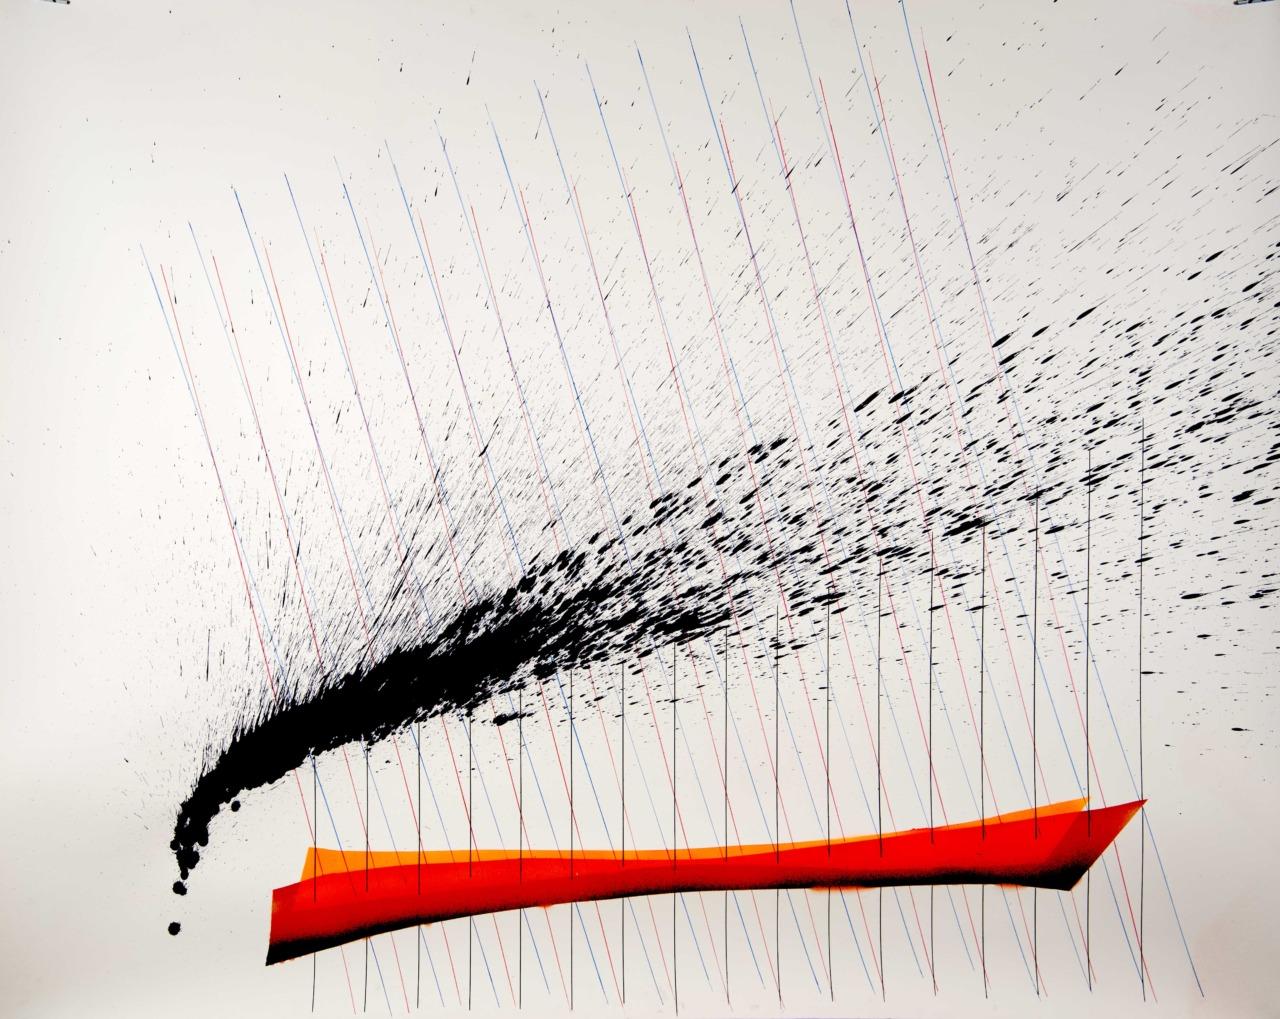 op280120. acrylic on paper 120x150cm